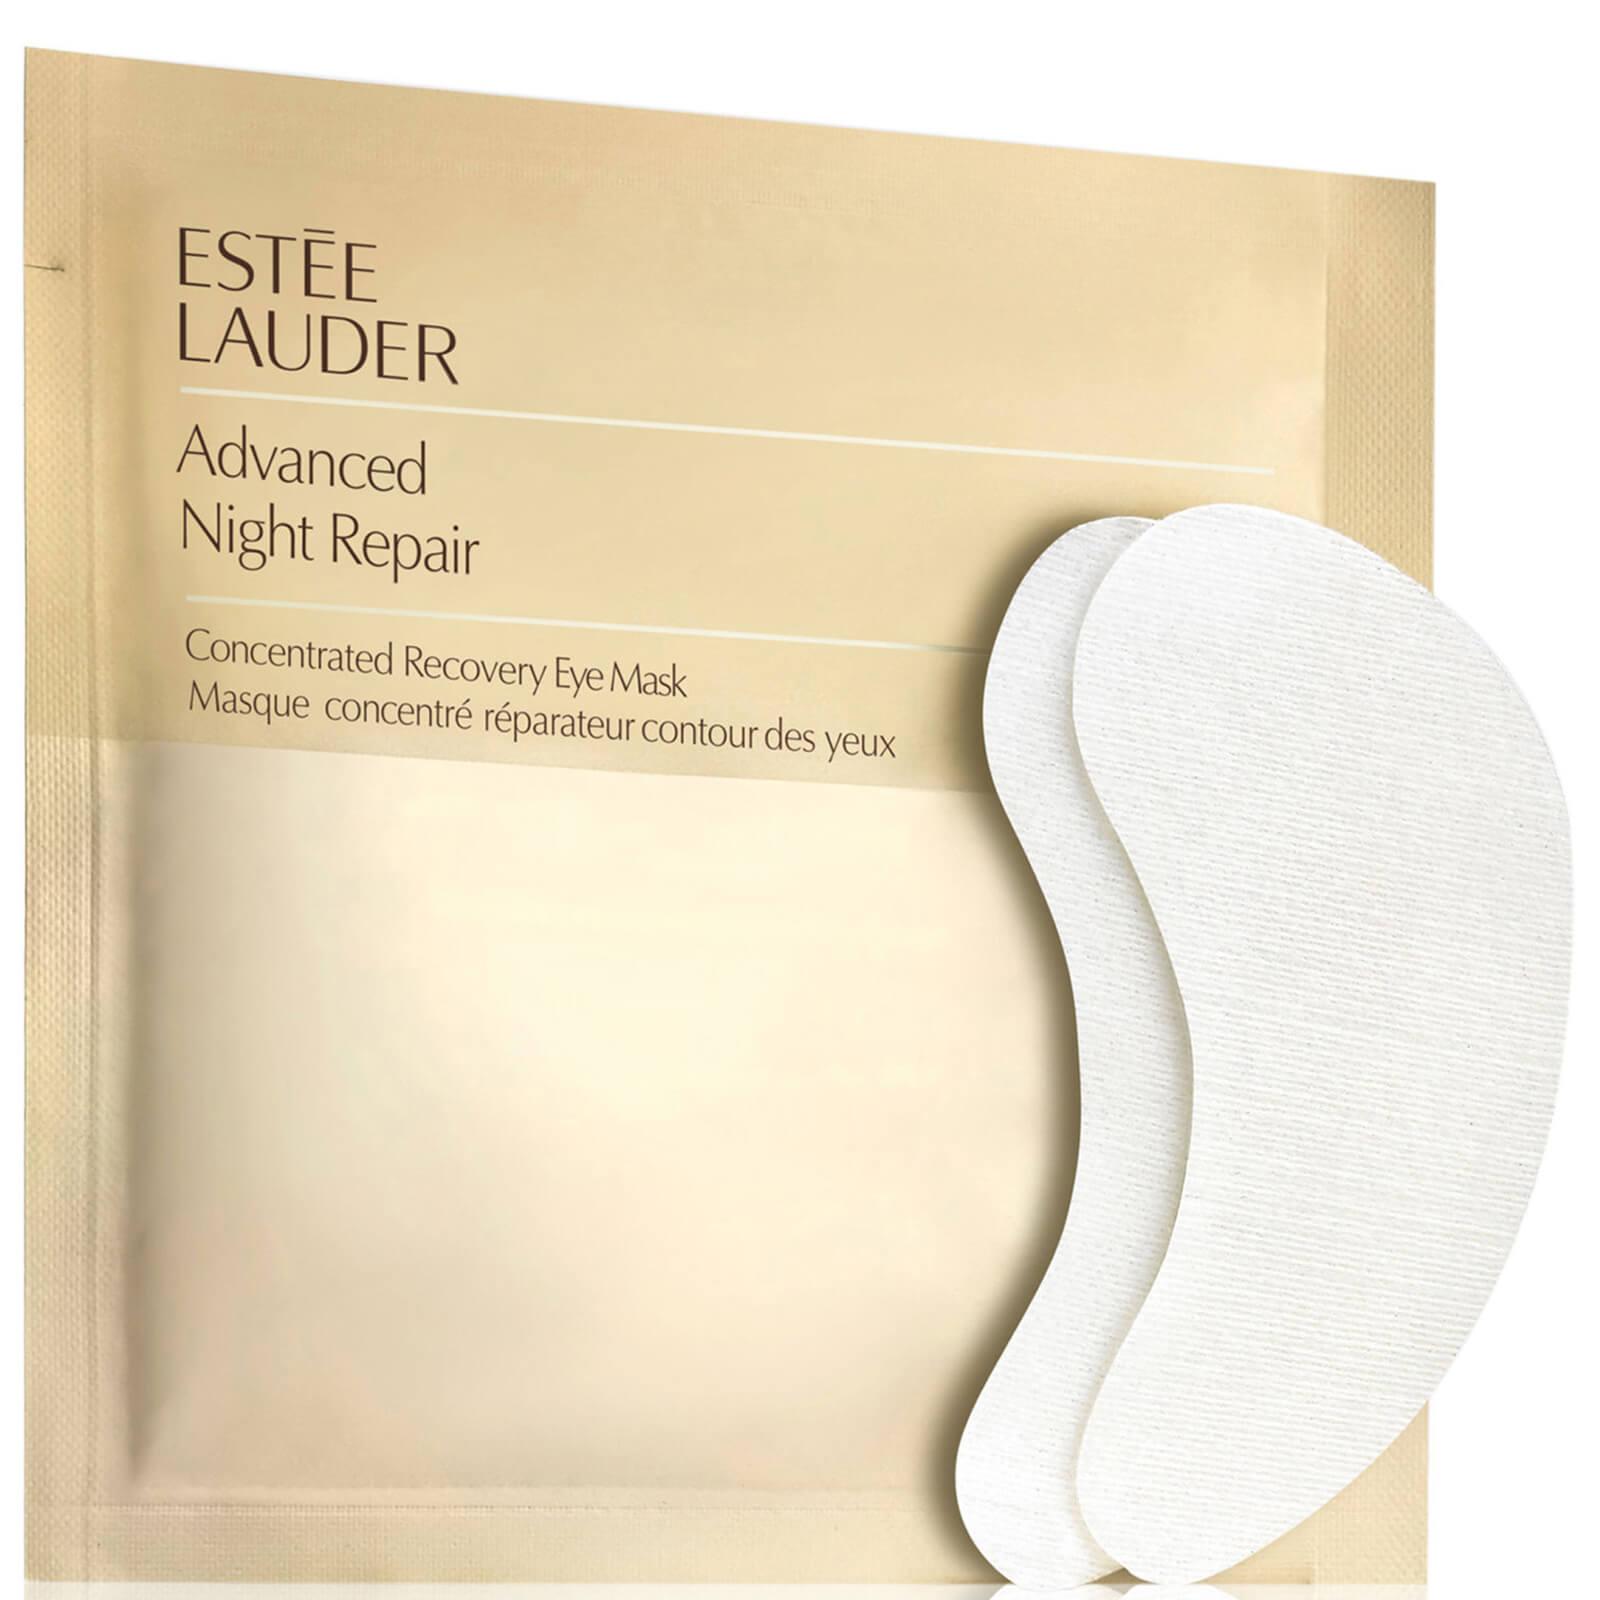 Estee Lauder Mascarilla para los ojos  Advanced Night Repair Concentrated Recovery Eye Mask (Pack de 4)